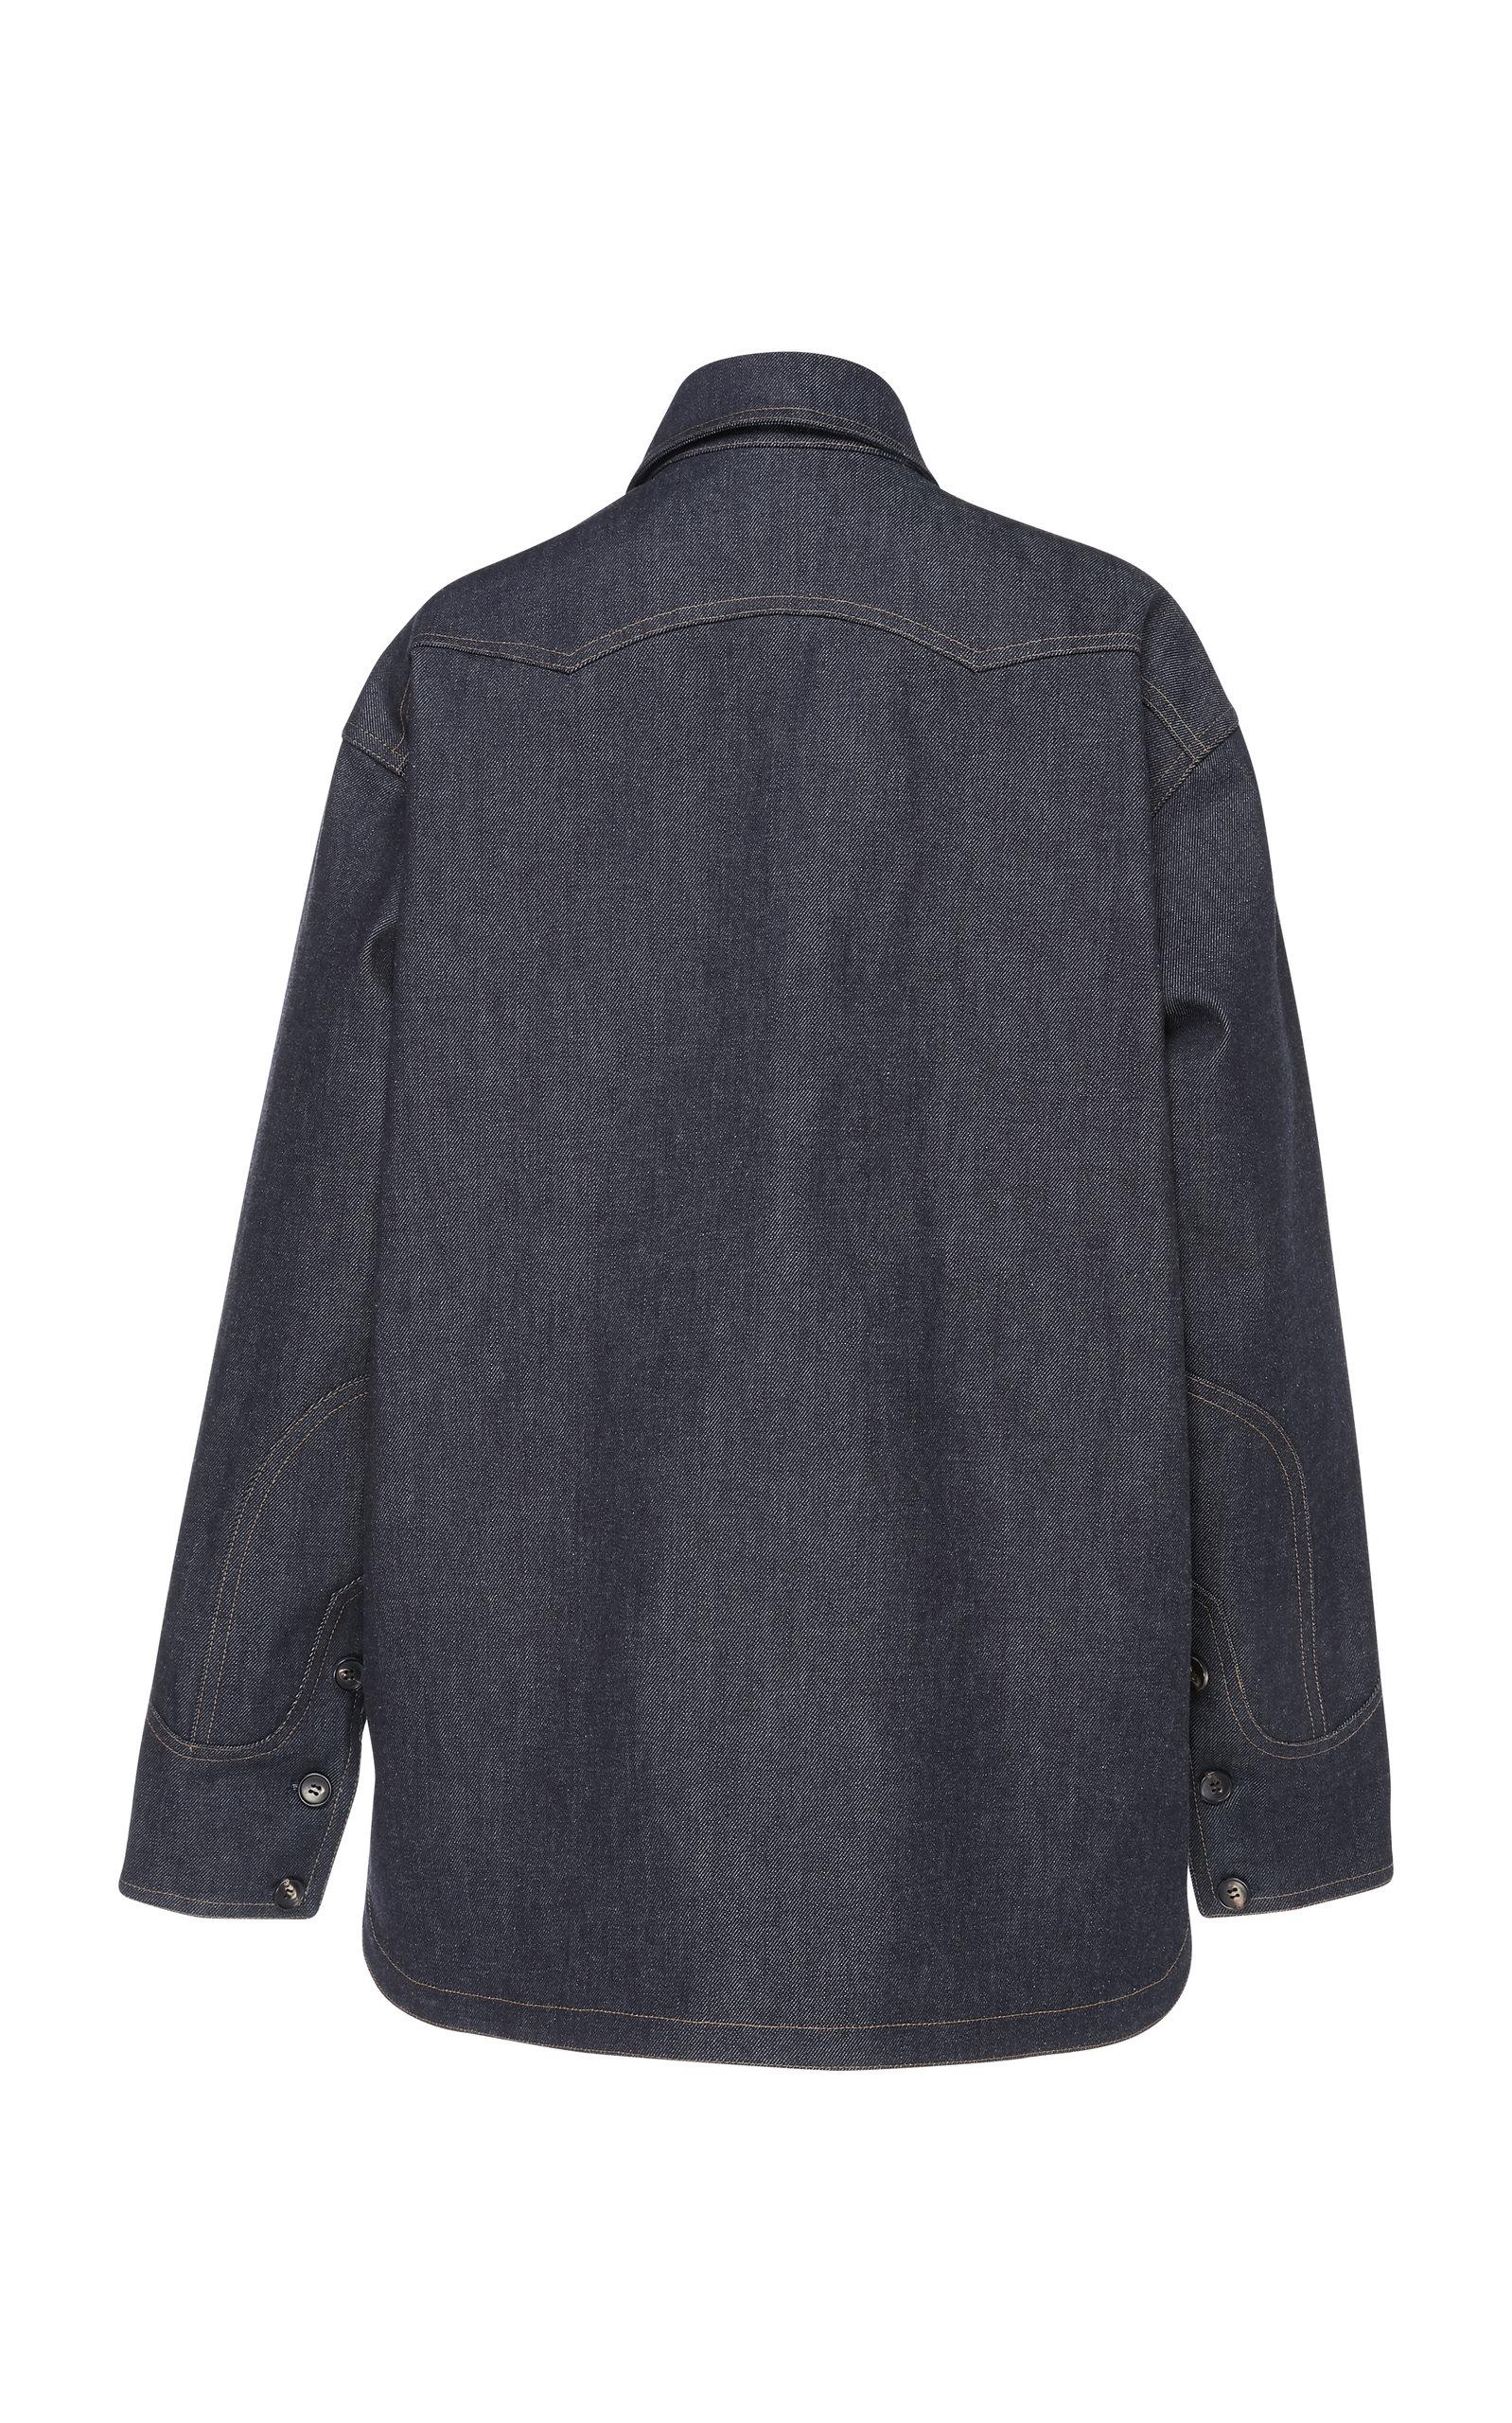 Jacket Jacket Victoria Shirt Jacket Shirt Shirt Denim Beckham Beckham Denim Victoria Denim Beckham Victoria 7WPPqFHXp